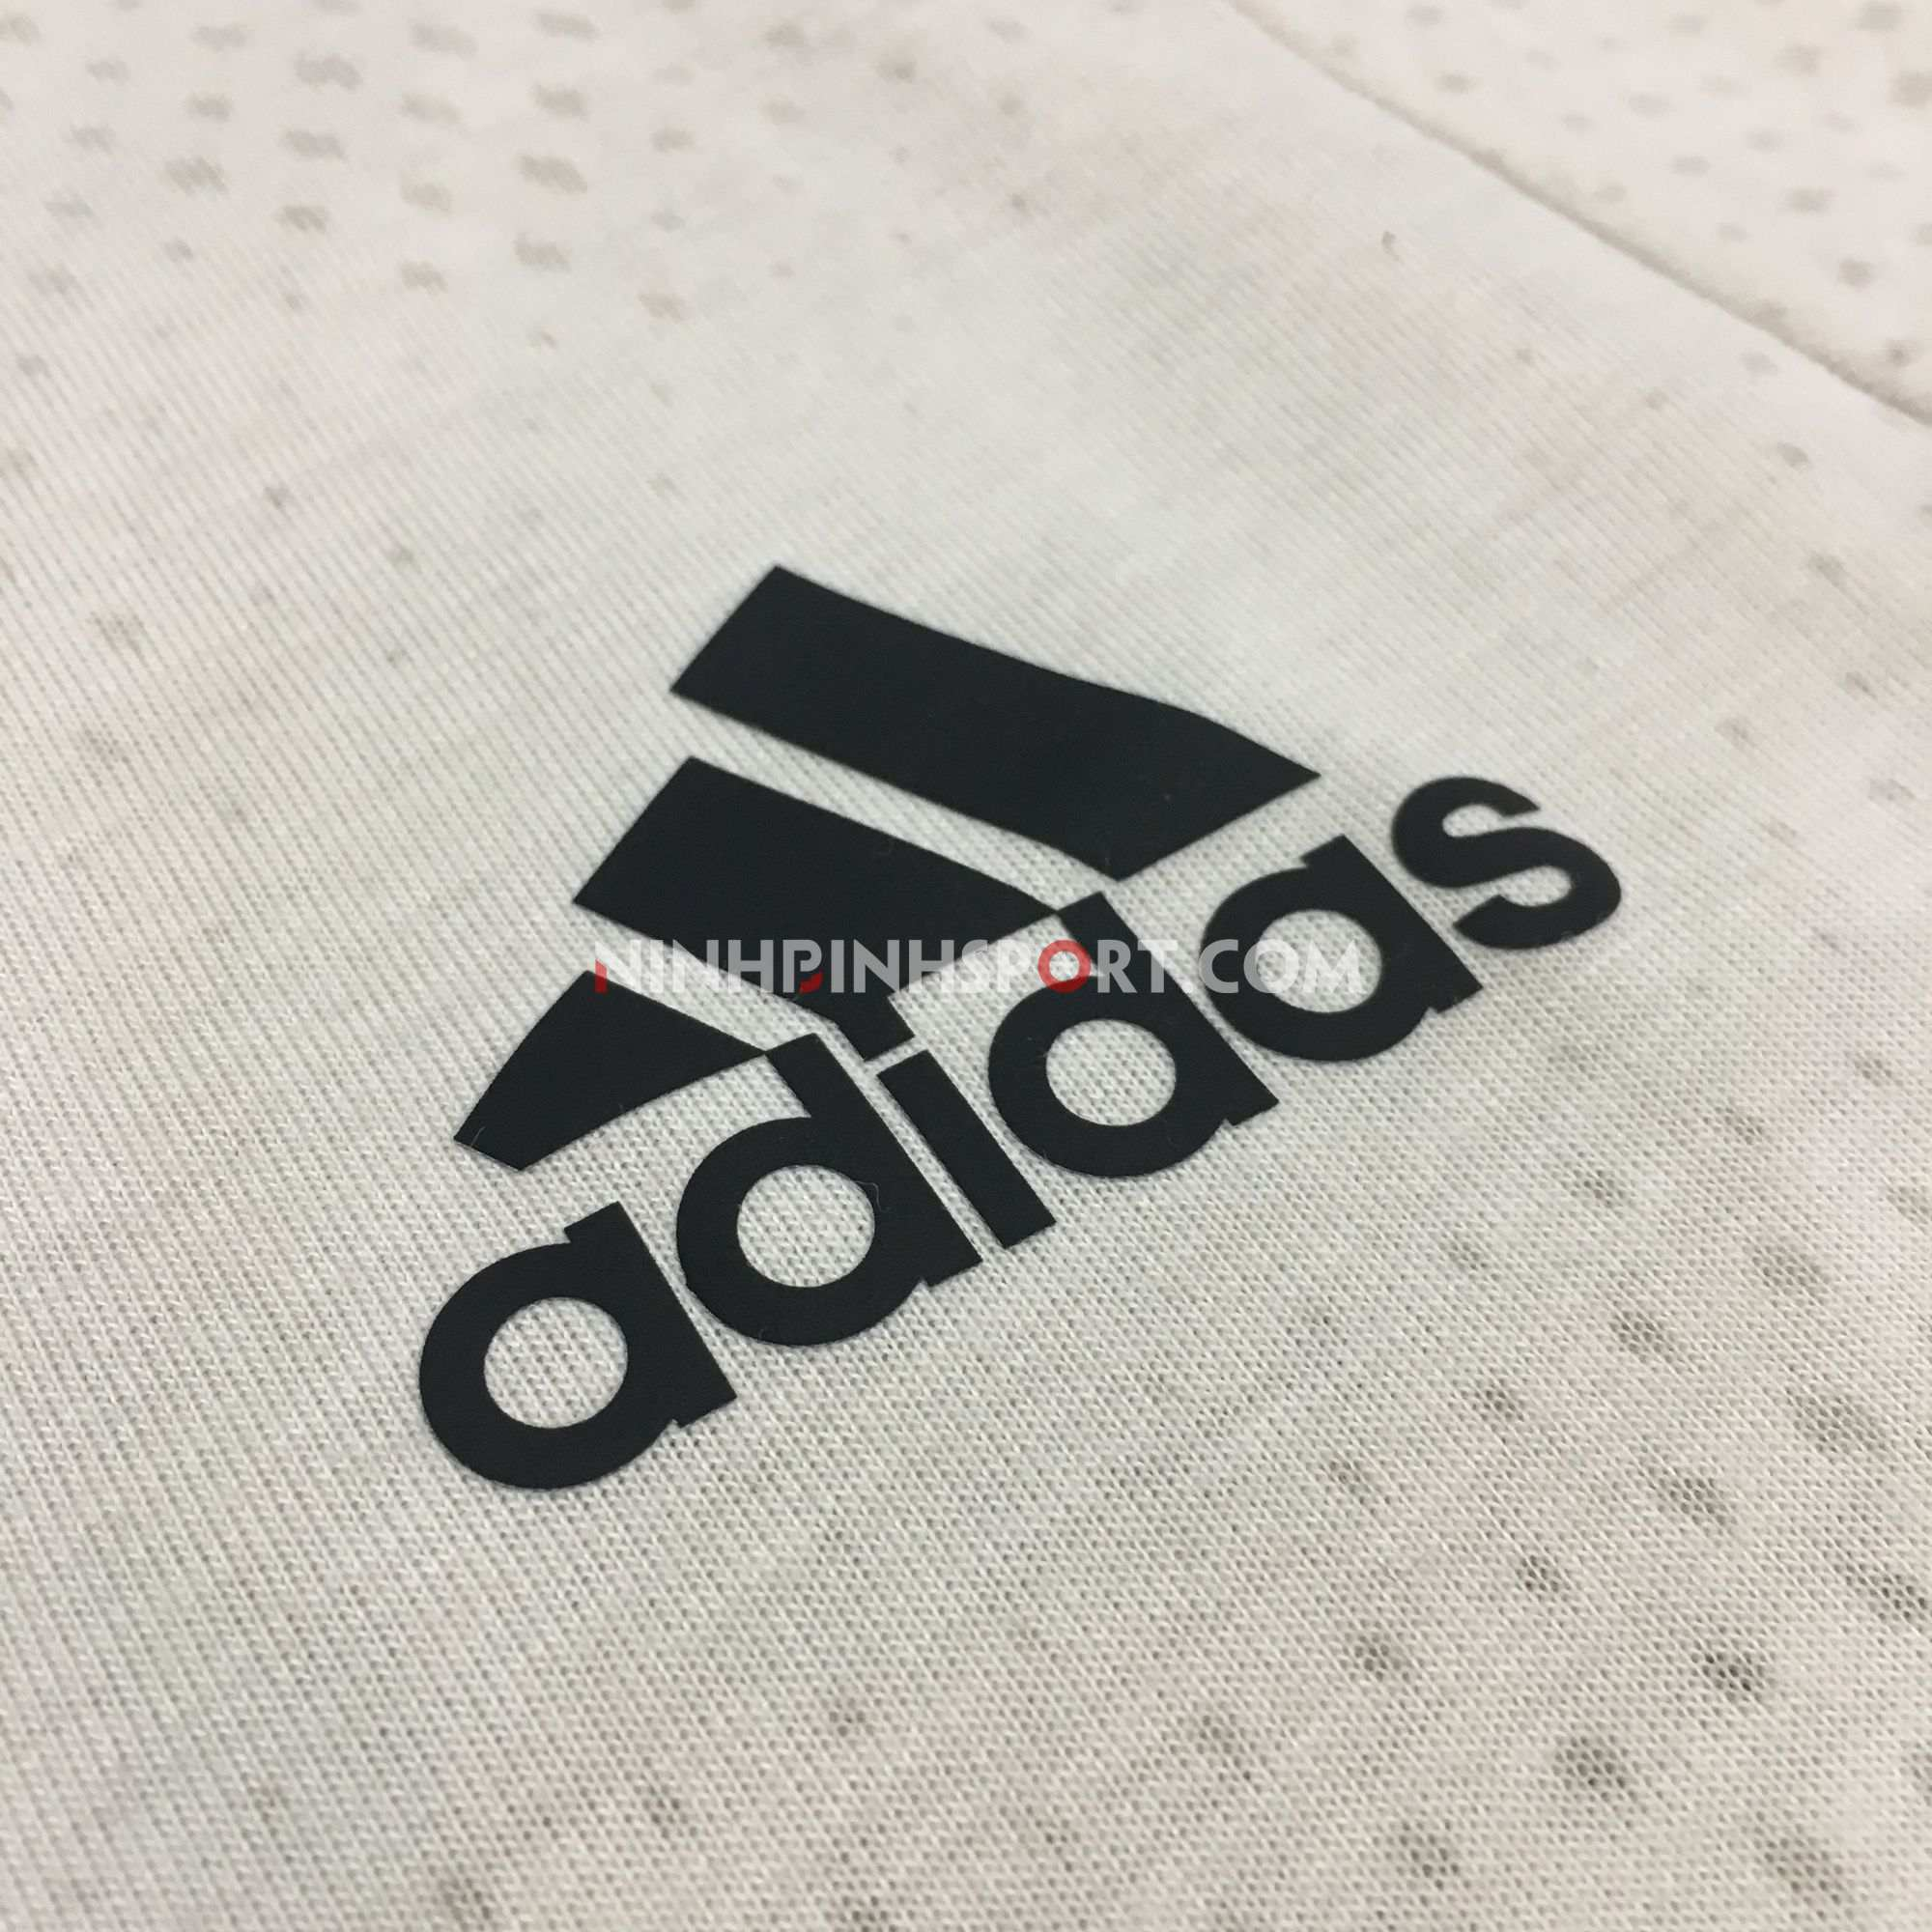 Áo thể thao nam Adidas FreeLift Tech Aeroknit Graphic DU1365